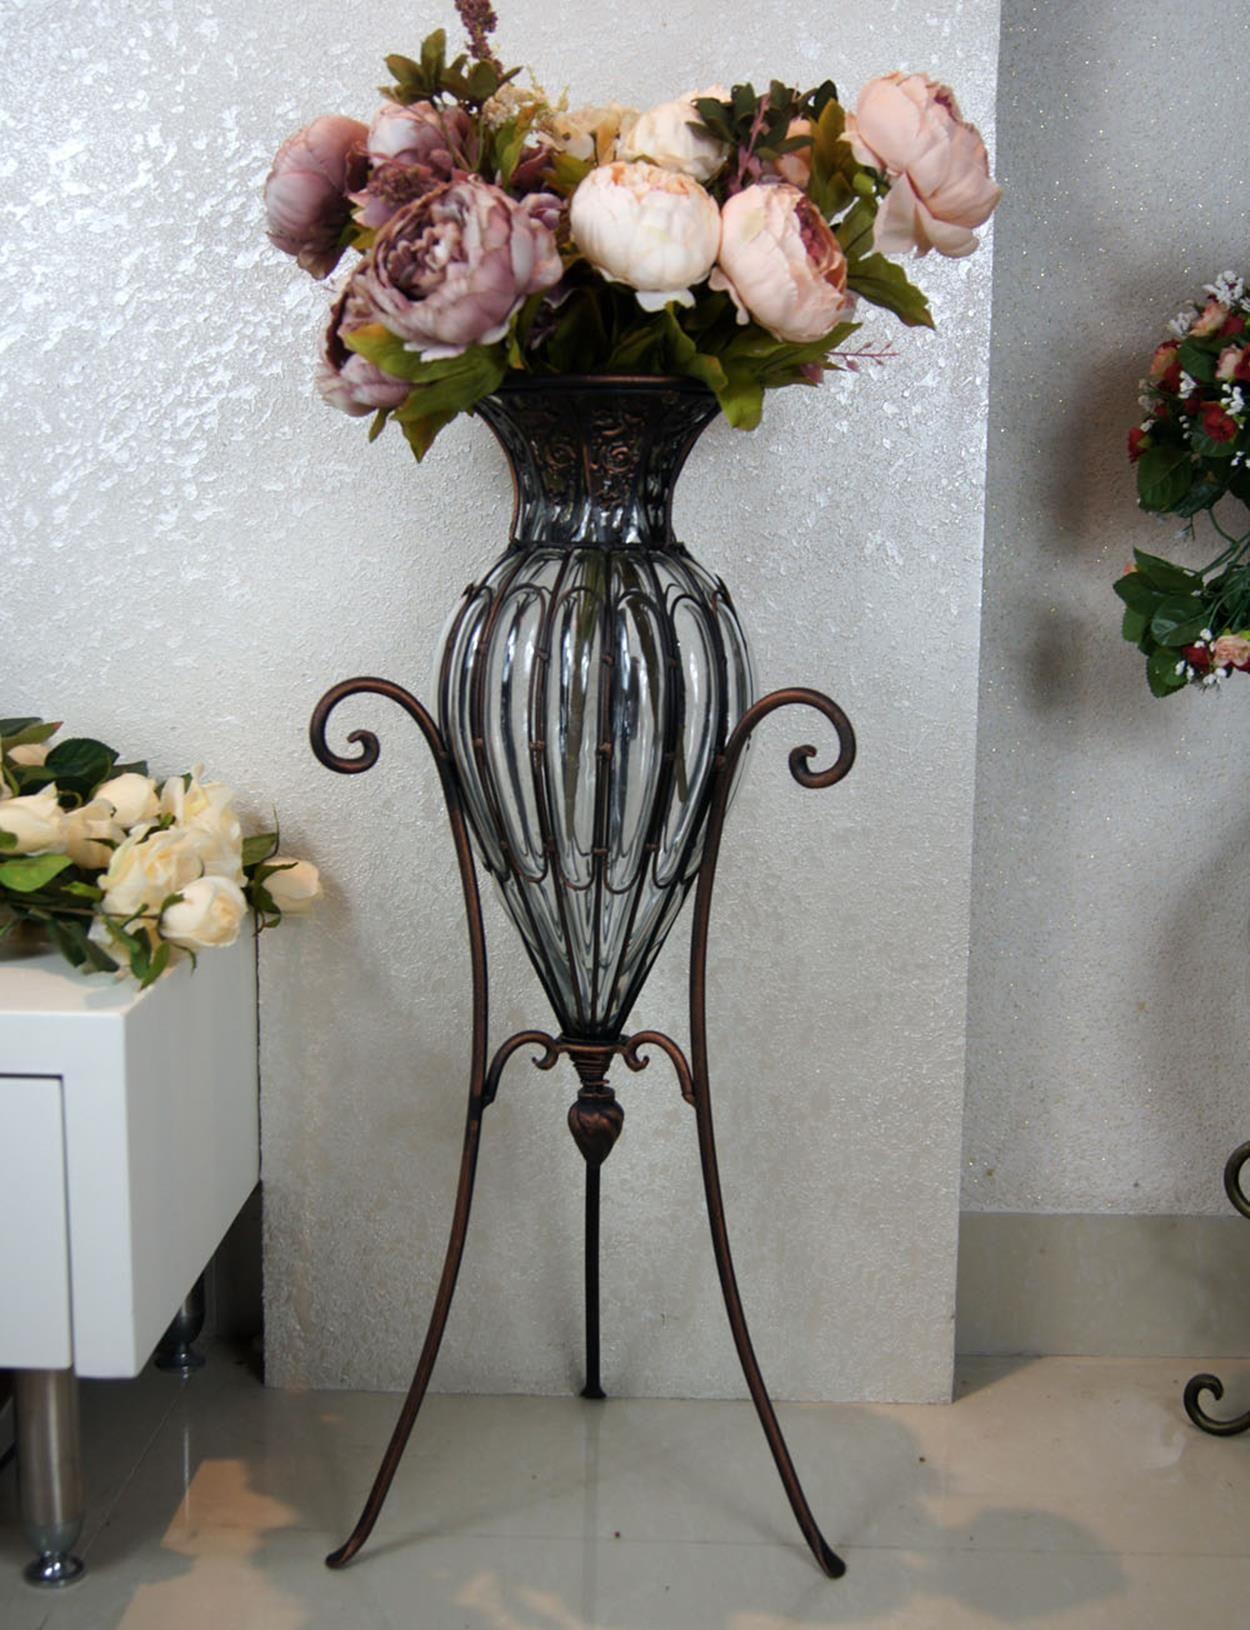 44 Diy Beautiful Flower Vase Decoration Ideas With Images